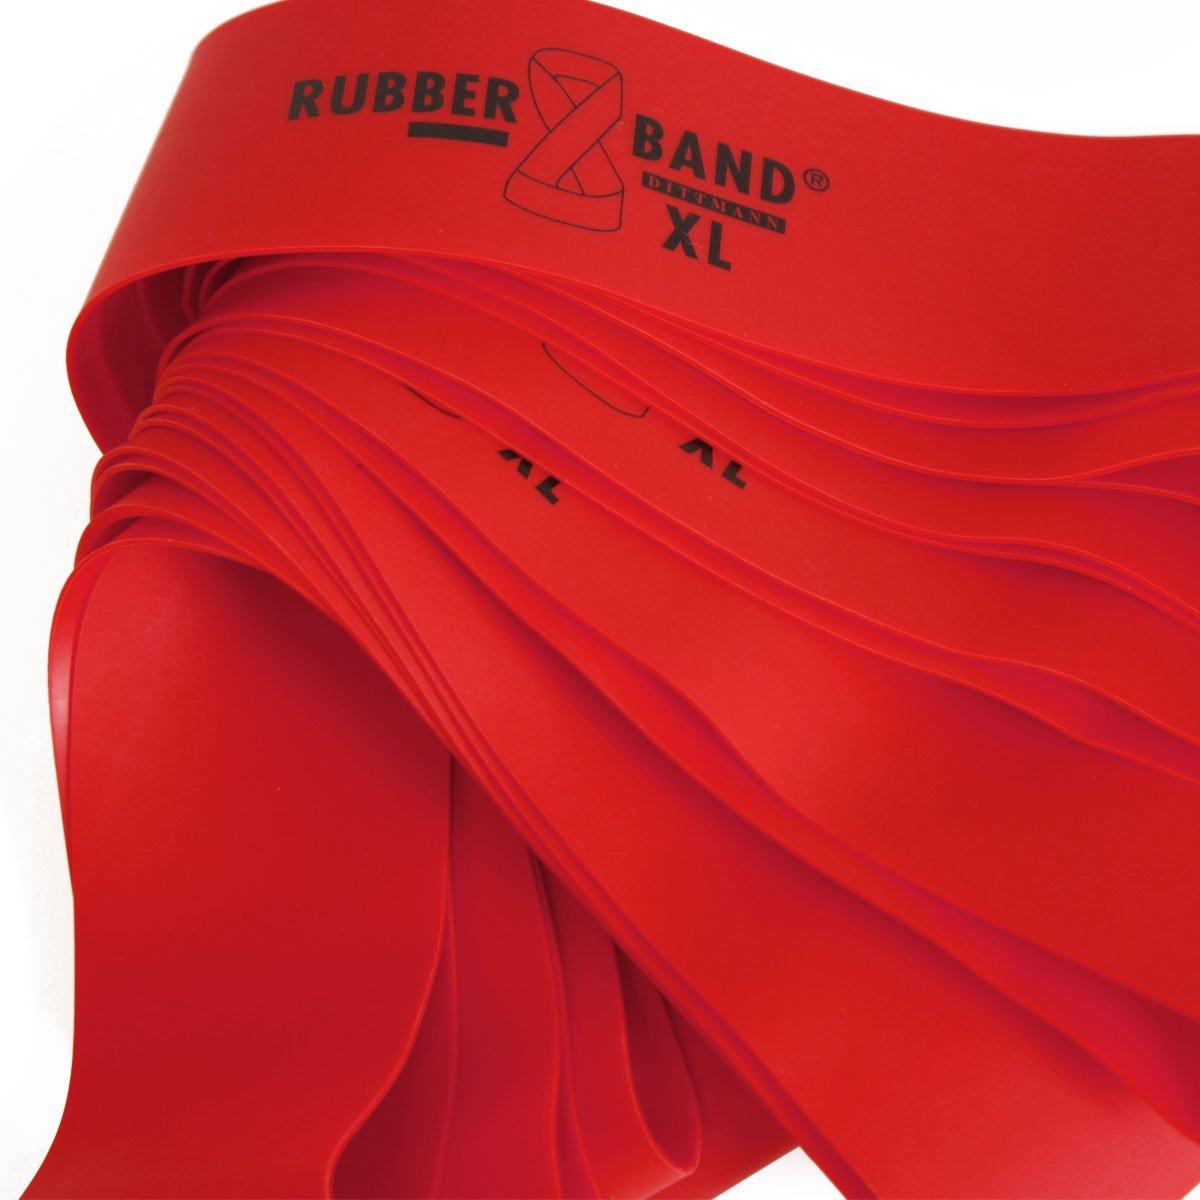 stark inkl /Übungsflyer 3 f/ür Muskelaufbau Krafttraining und Fitness Expander f/ür Gummiband Sport FTM Dittmann/® Rubberband XL in Rot